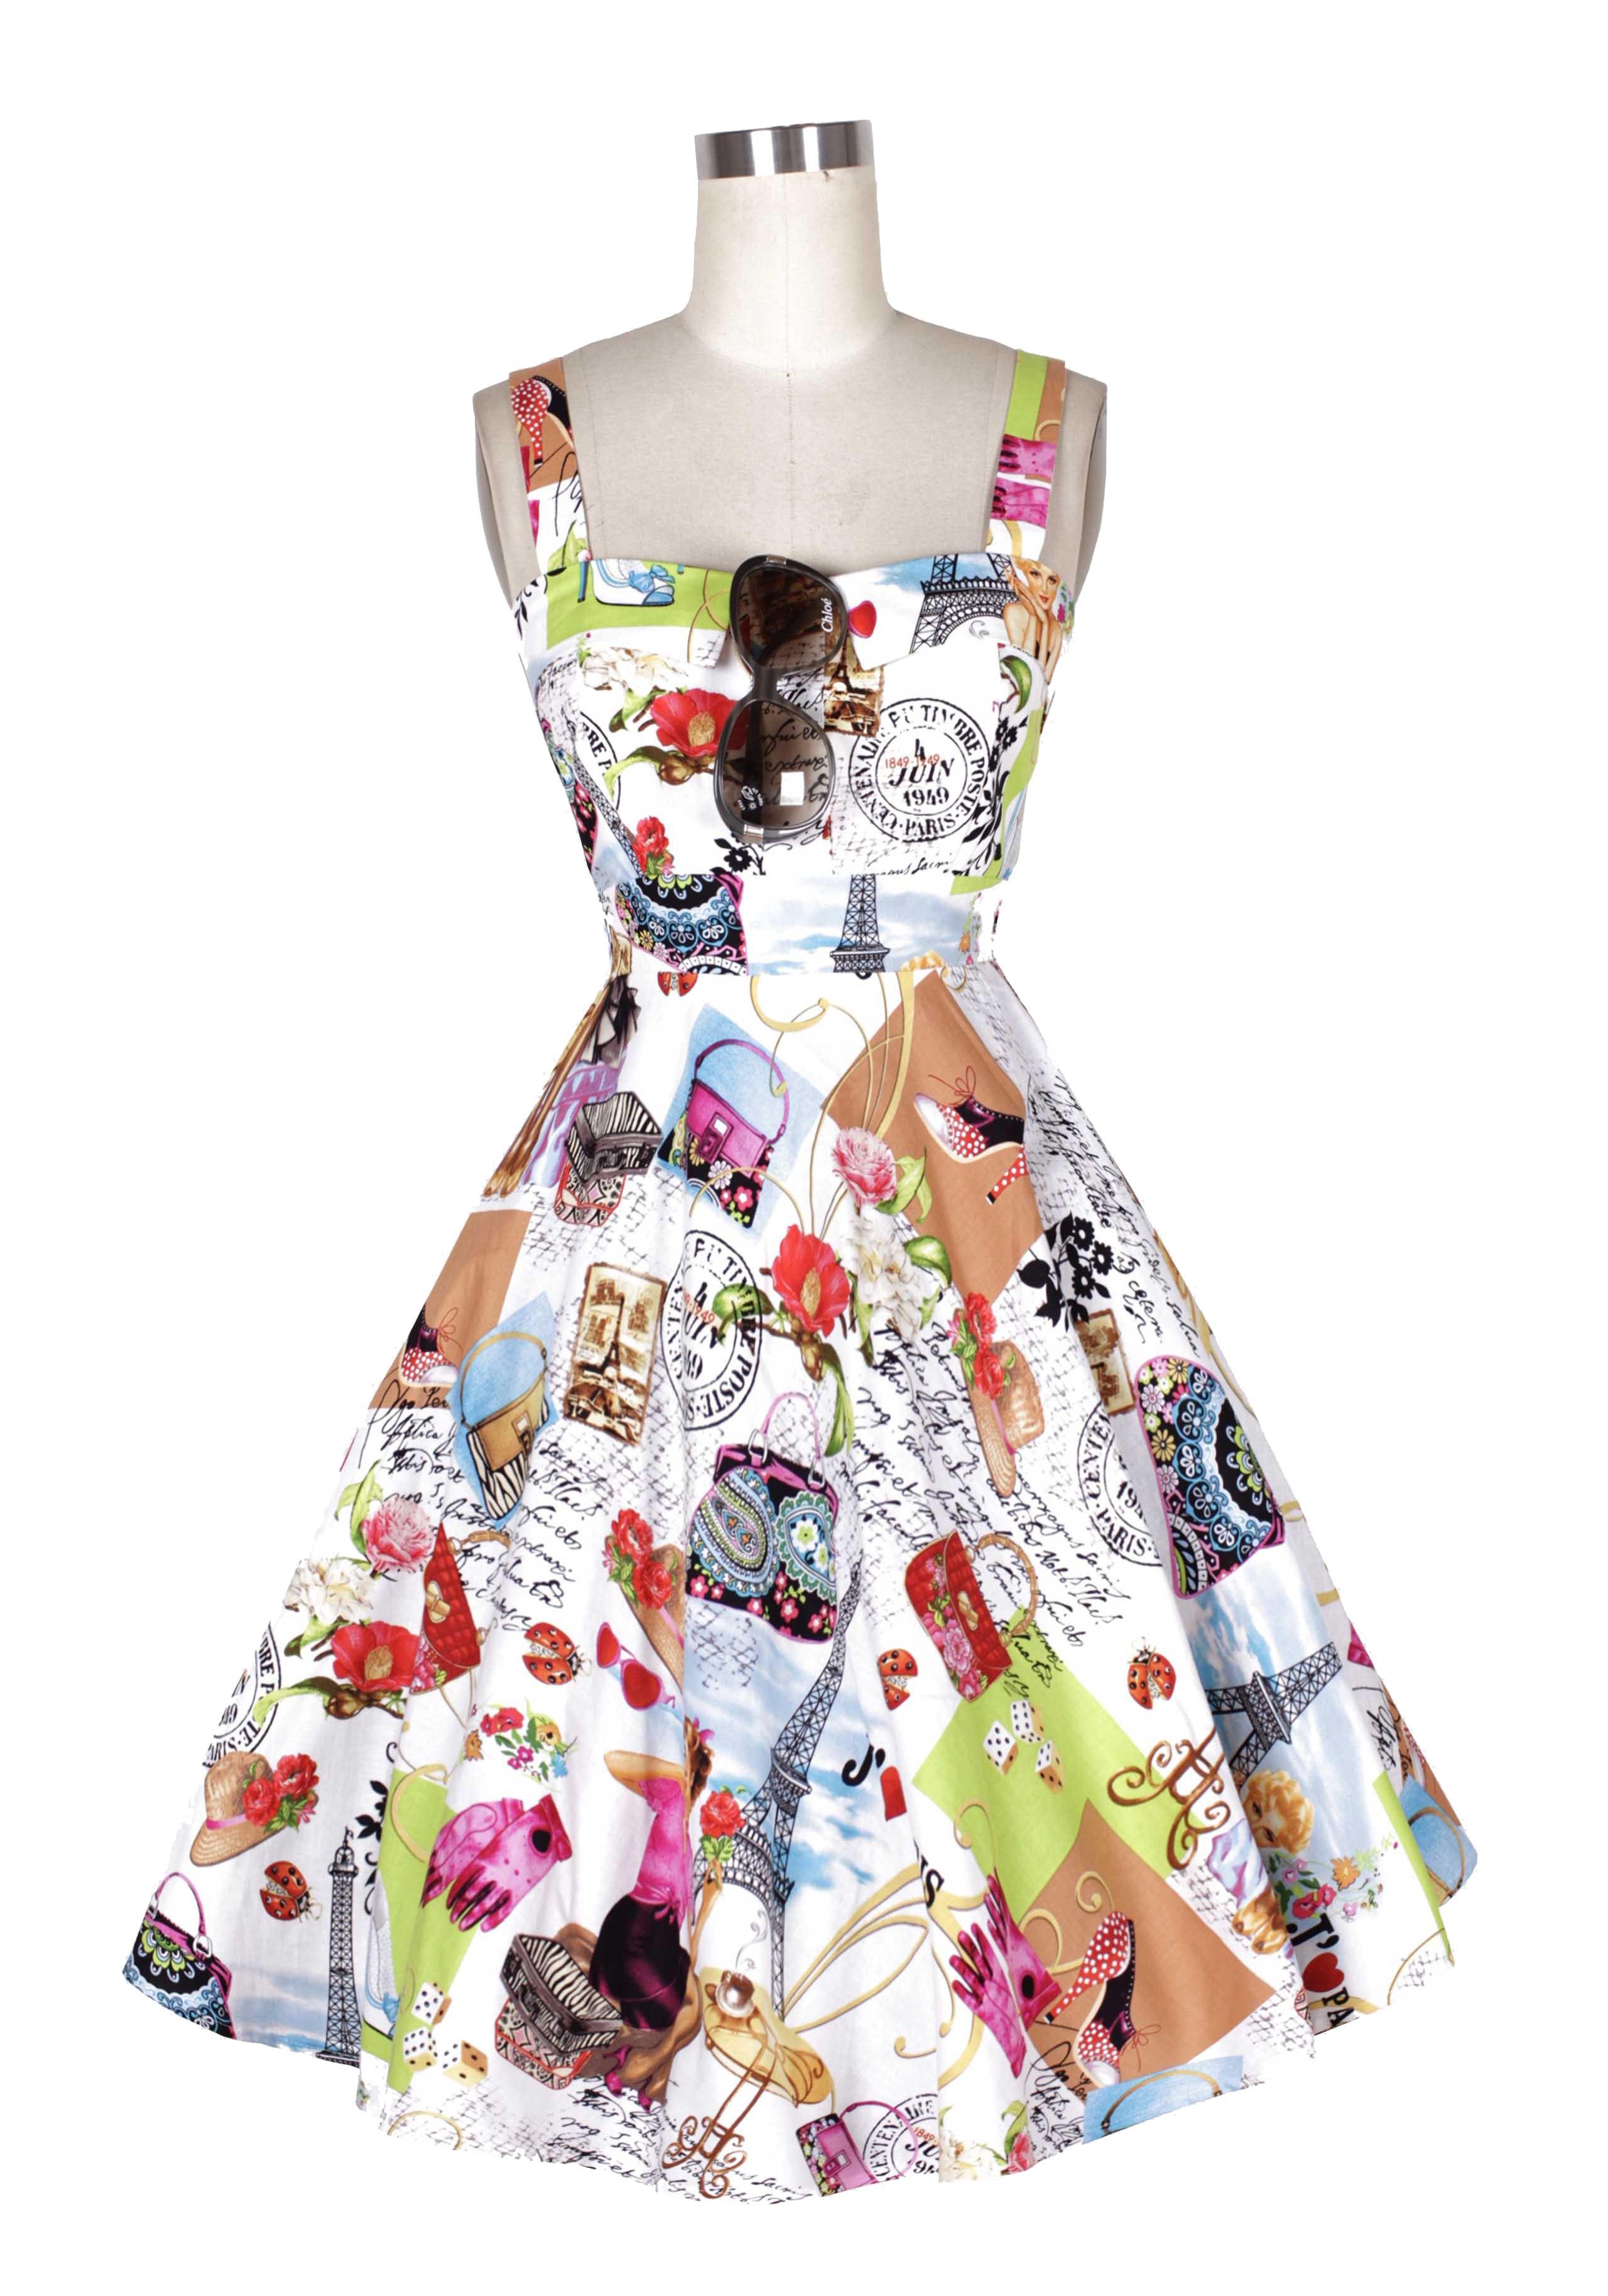 Paris on the loose dress